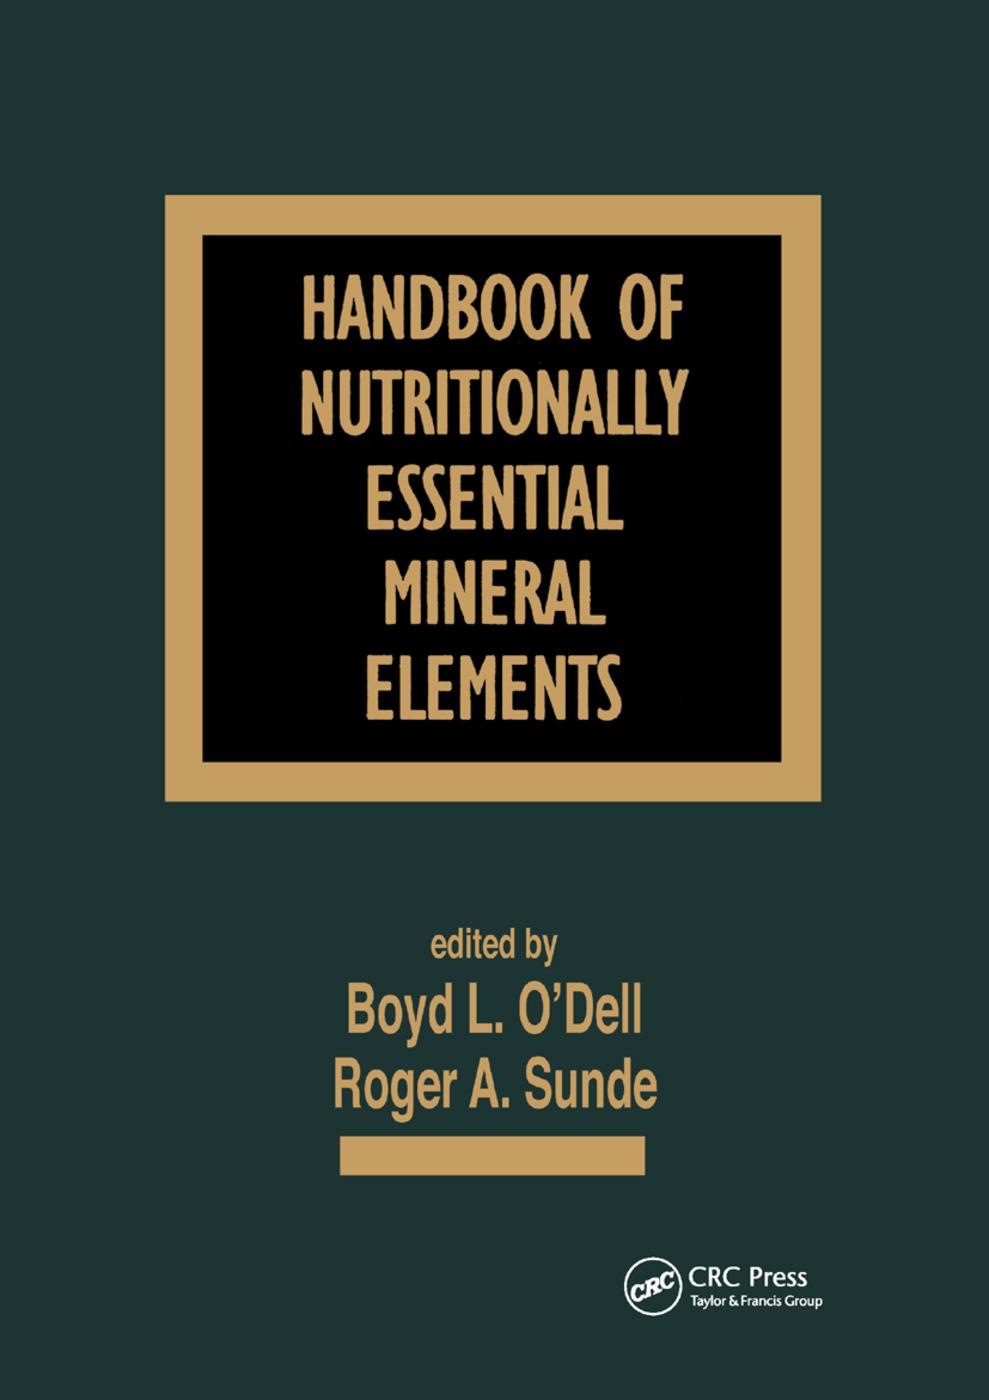 Handbook of Nutritionally Essential Mineral Elements